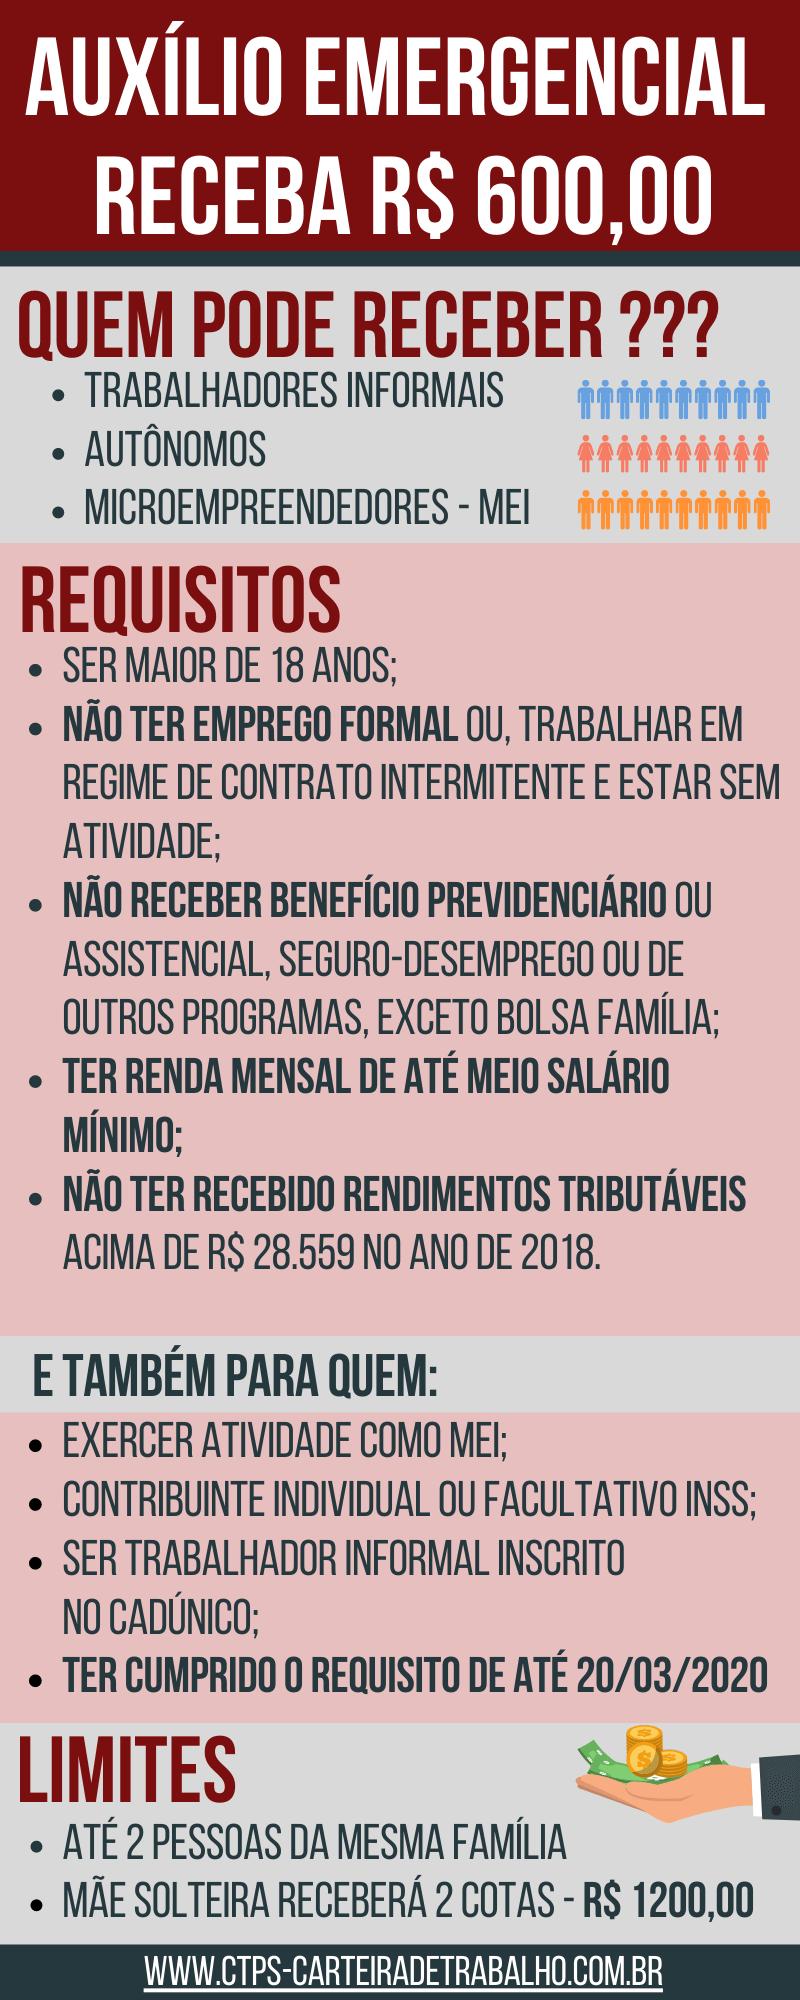 Auxílio Emergencial CTPS